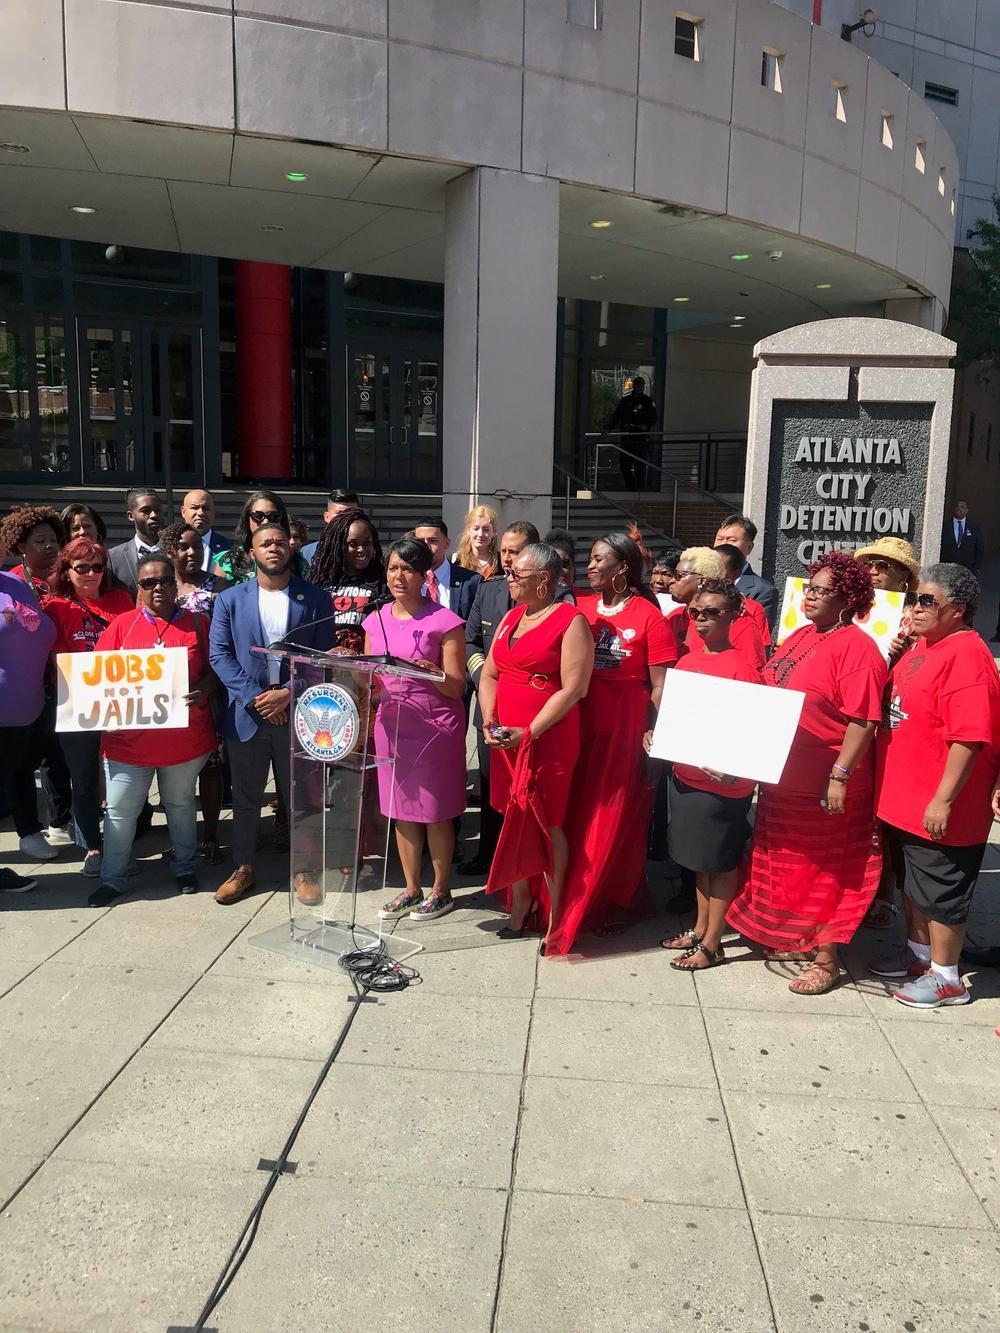 Atlanta Mayor Keisha Lance Bottoms signs legislation forming a task force to close and repurpose the city jail.